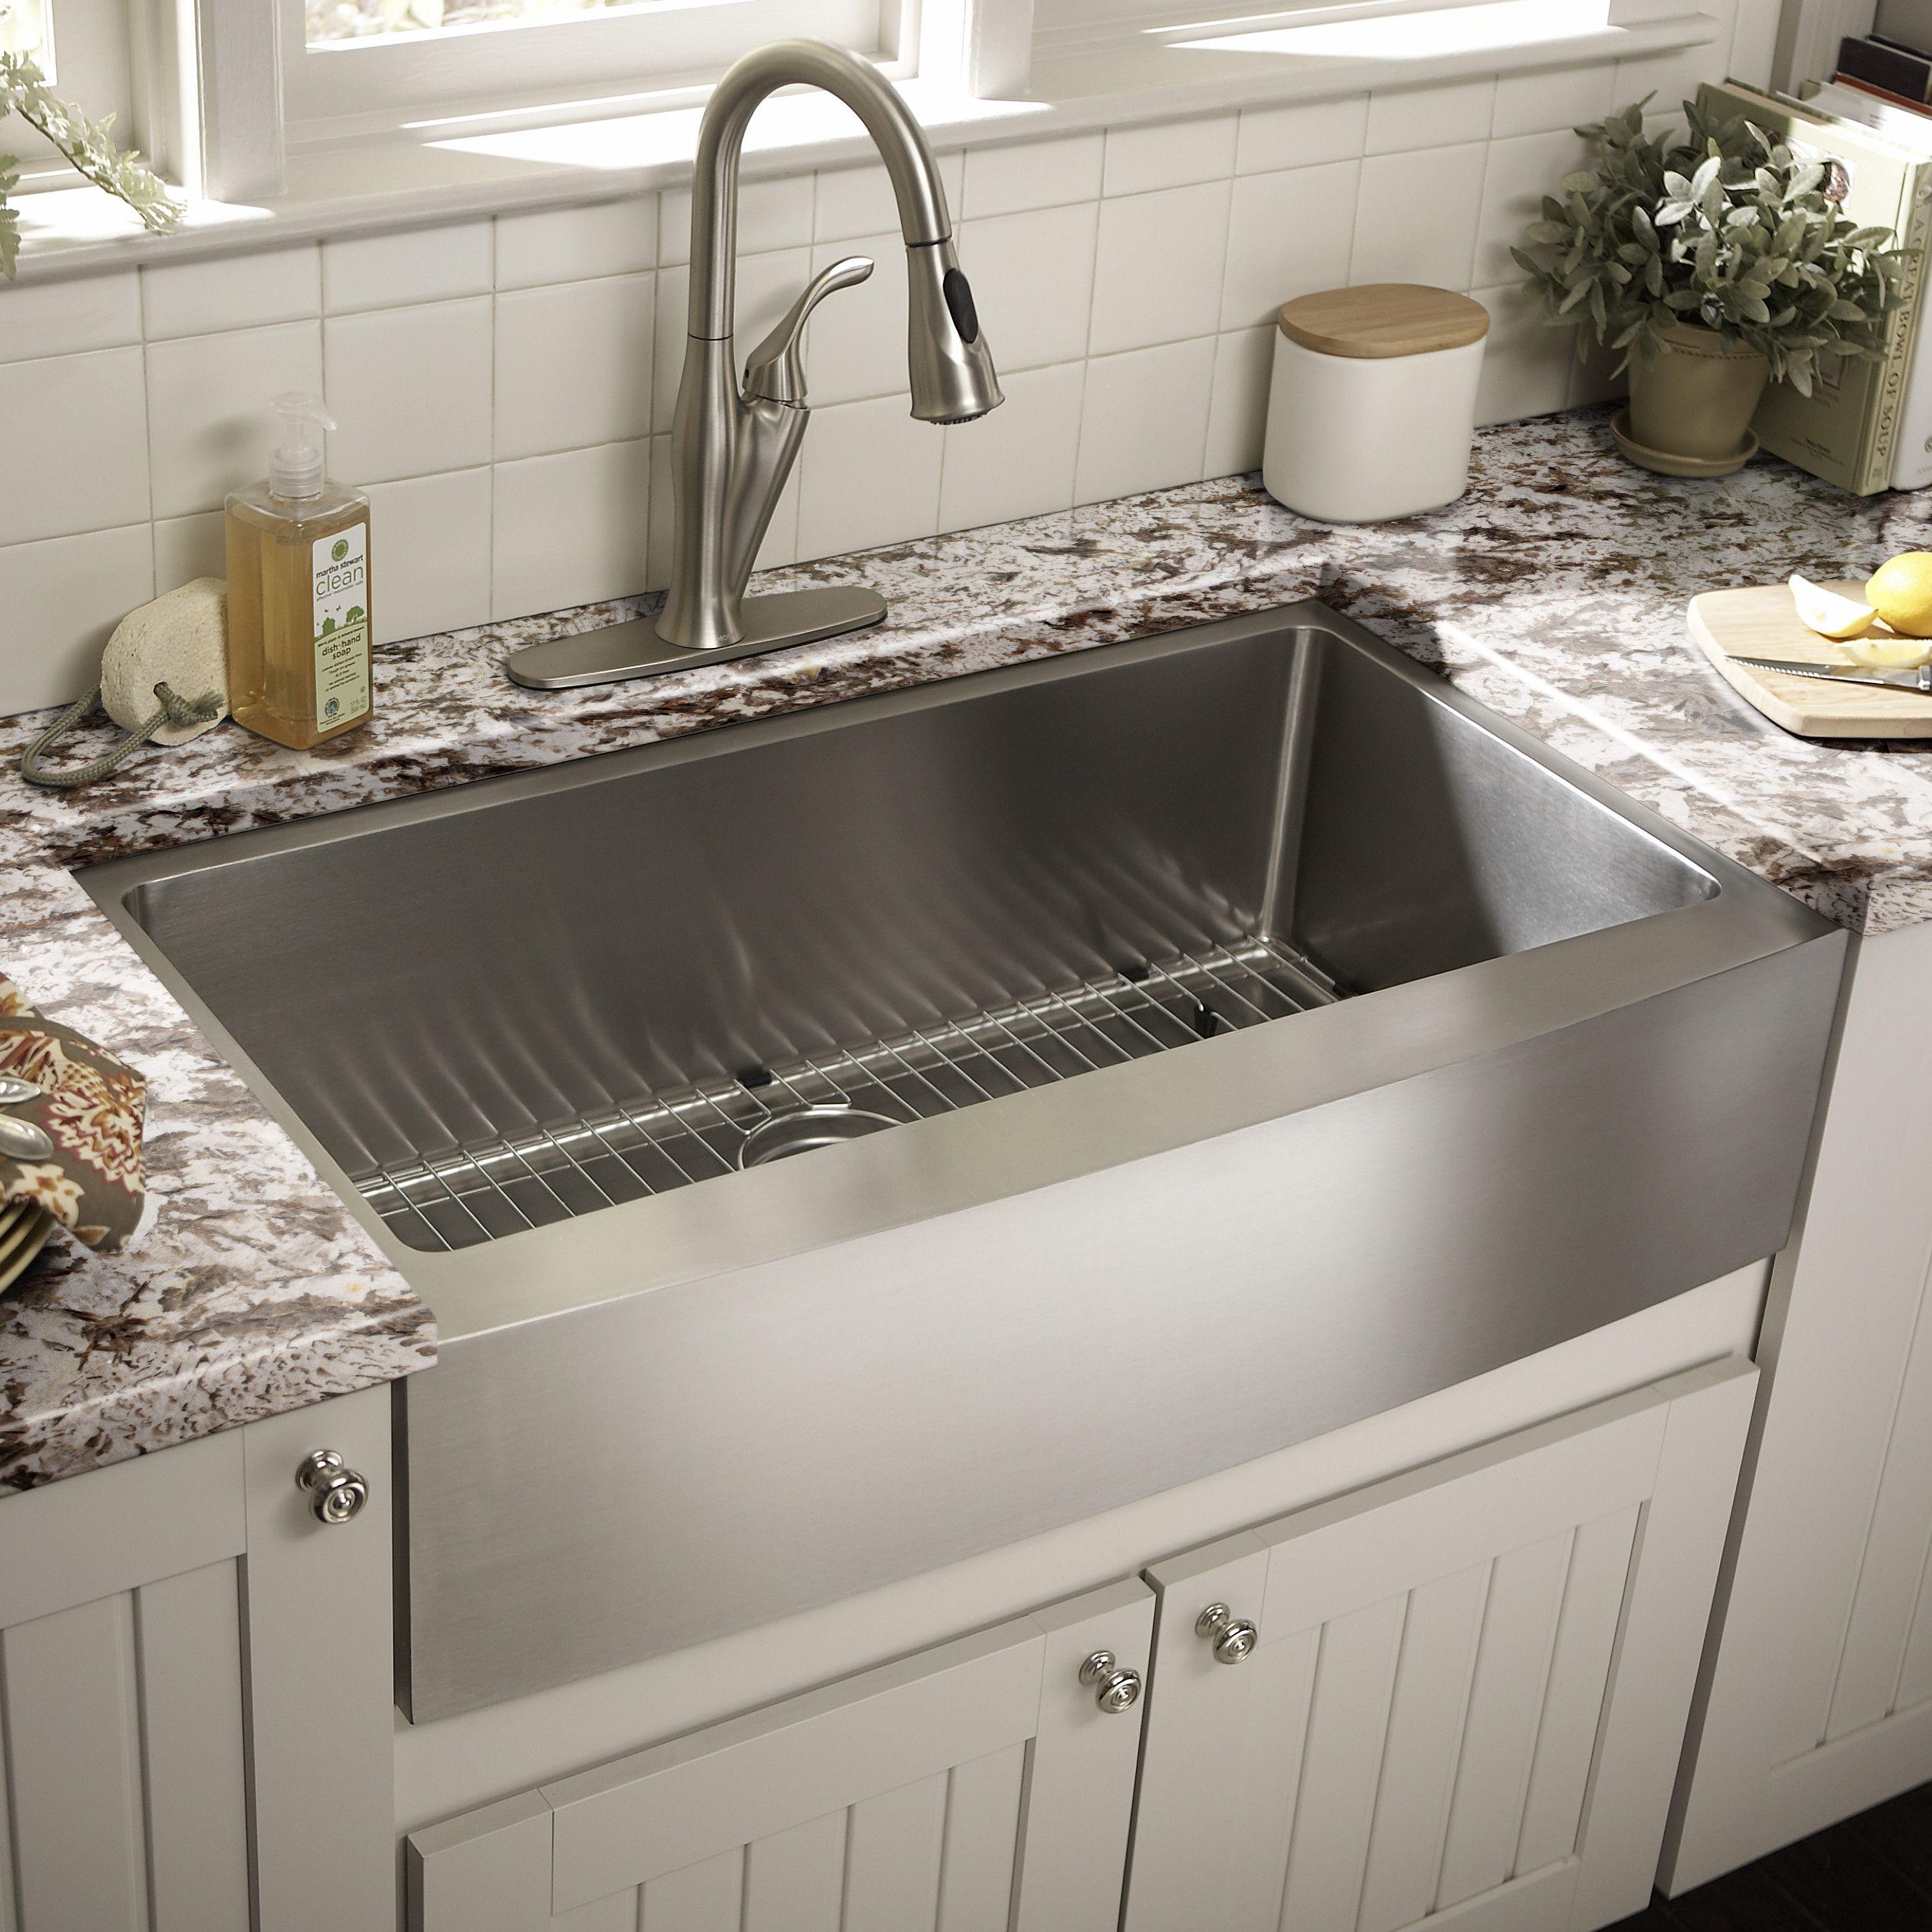 Customer Image Zoomed Farmhouse sink kitchen, Kitchen